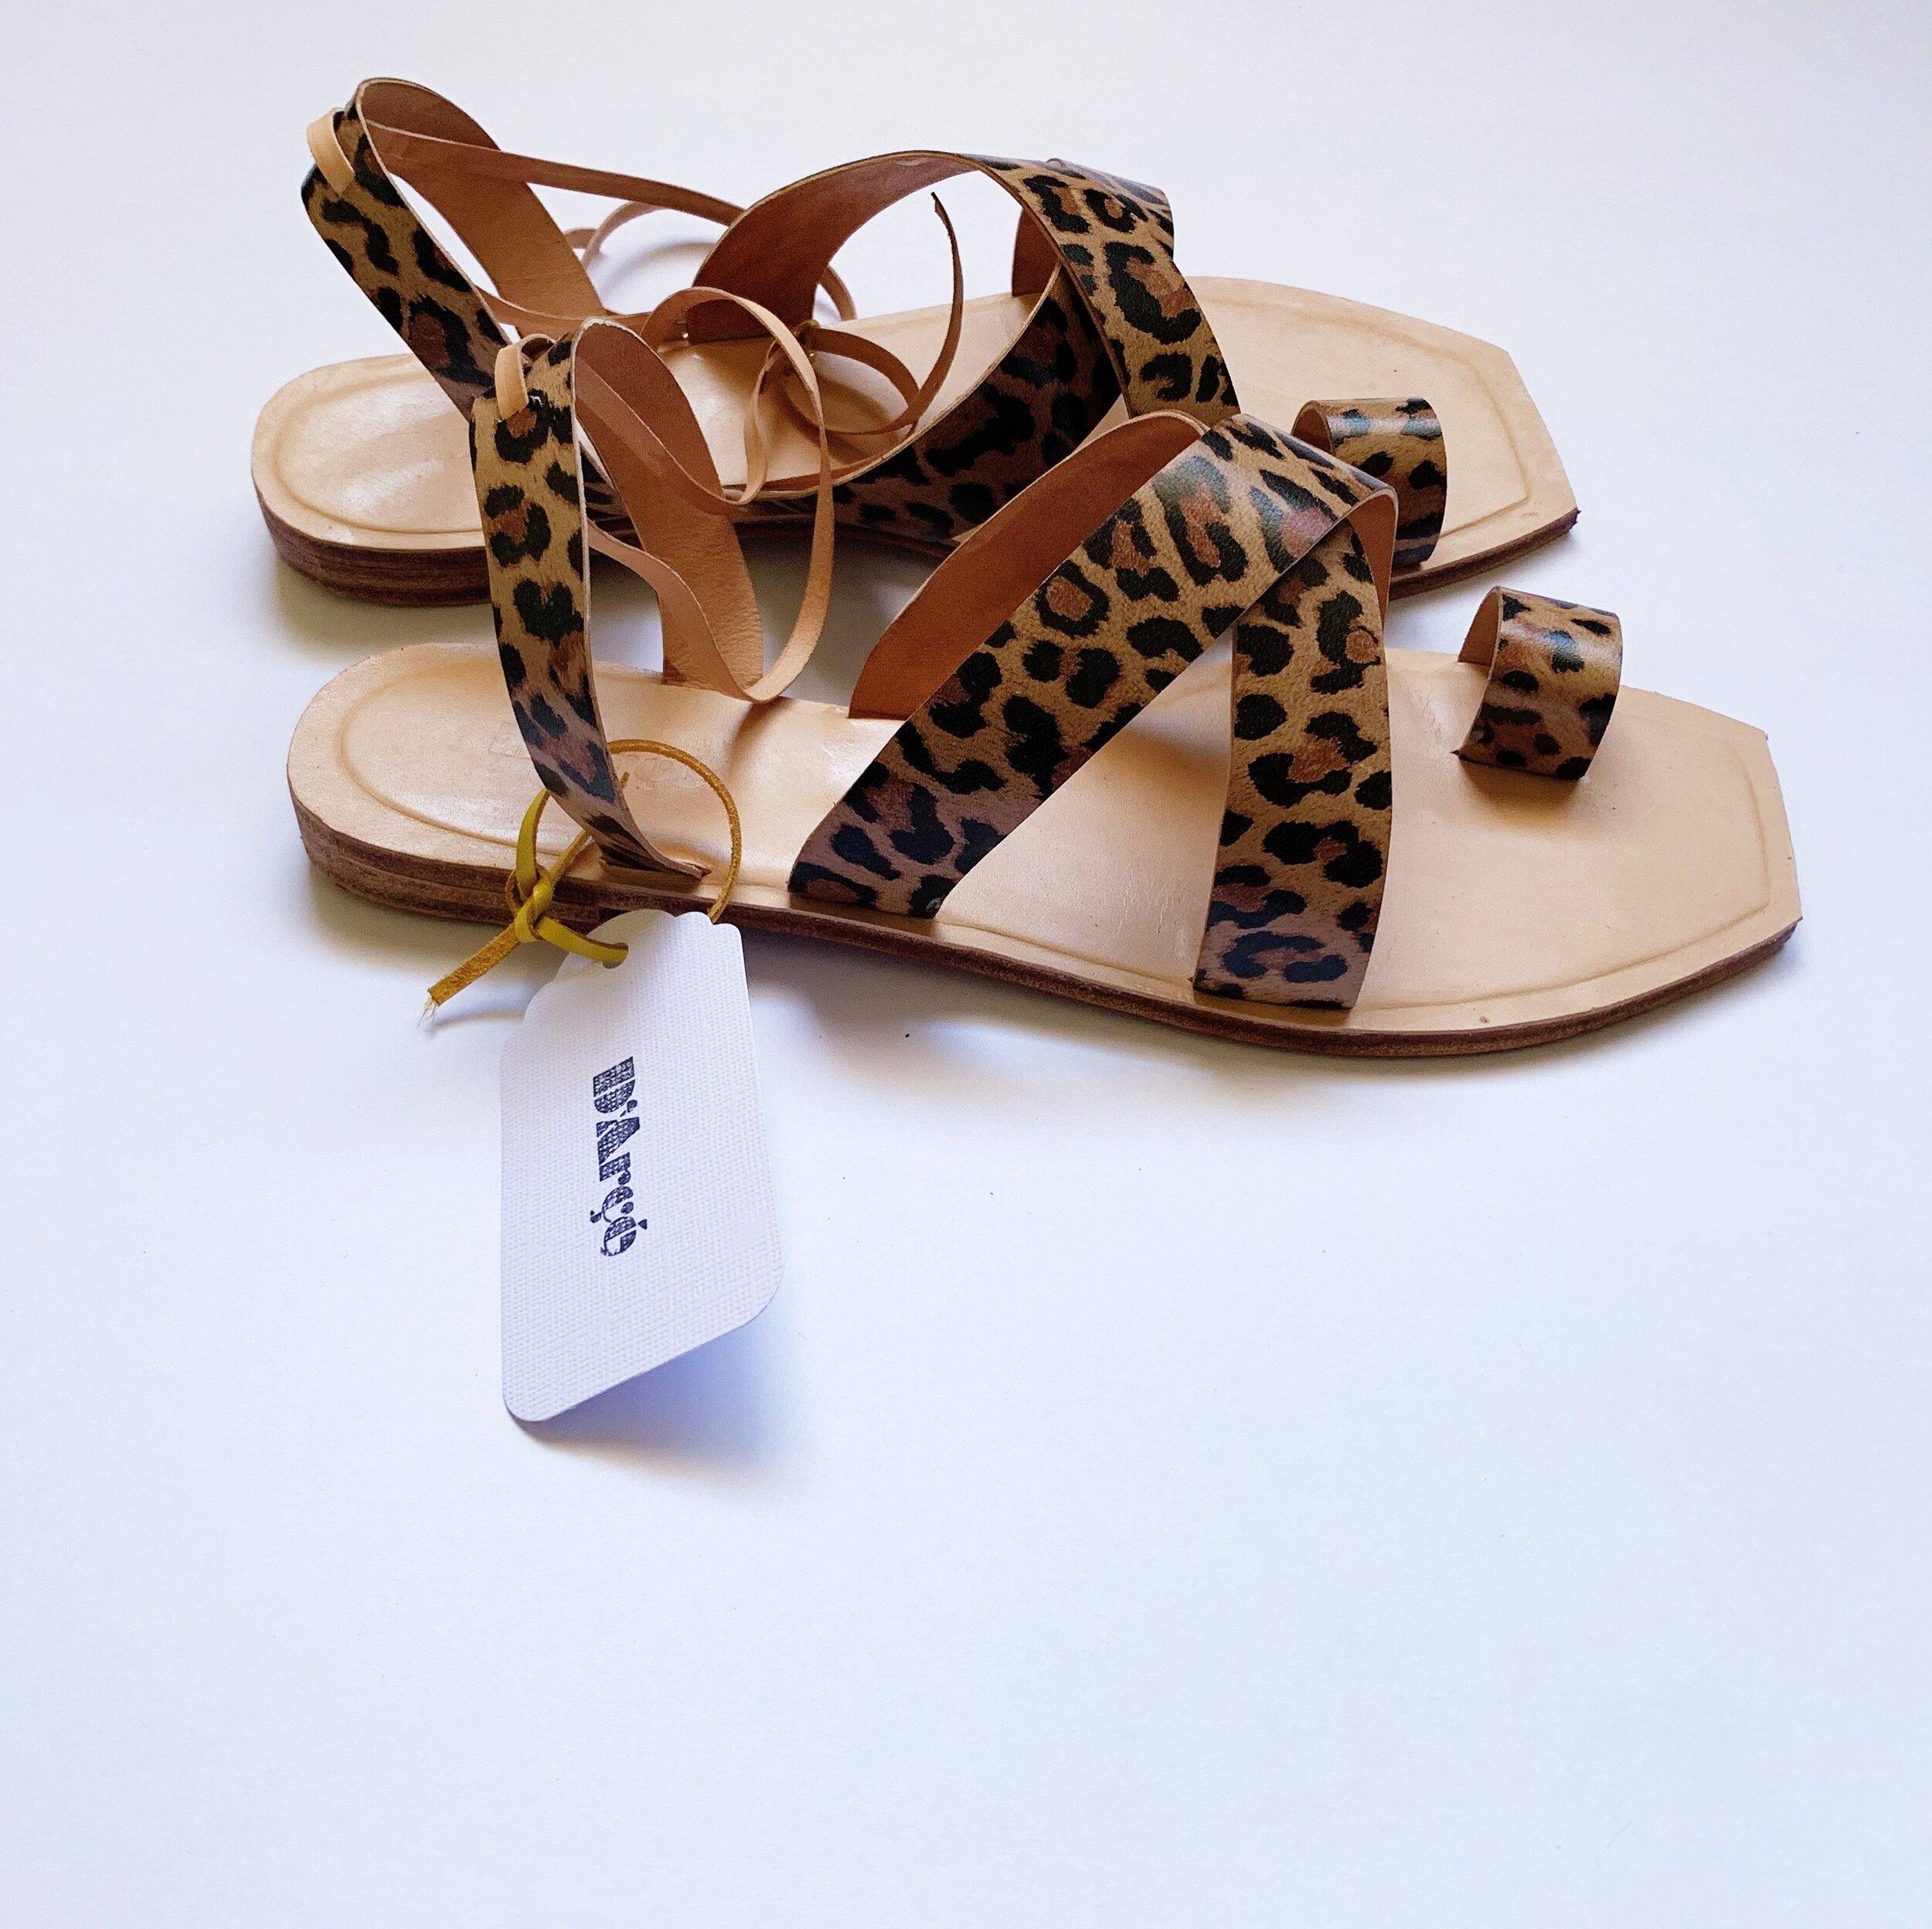 Leopard Print Story leather women's sandals